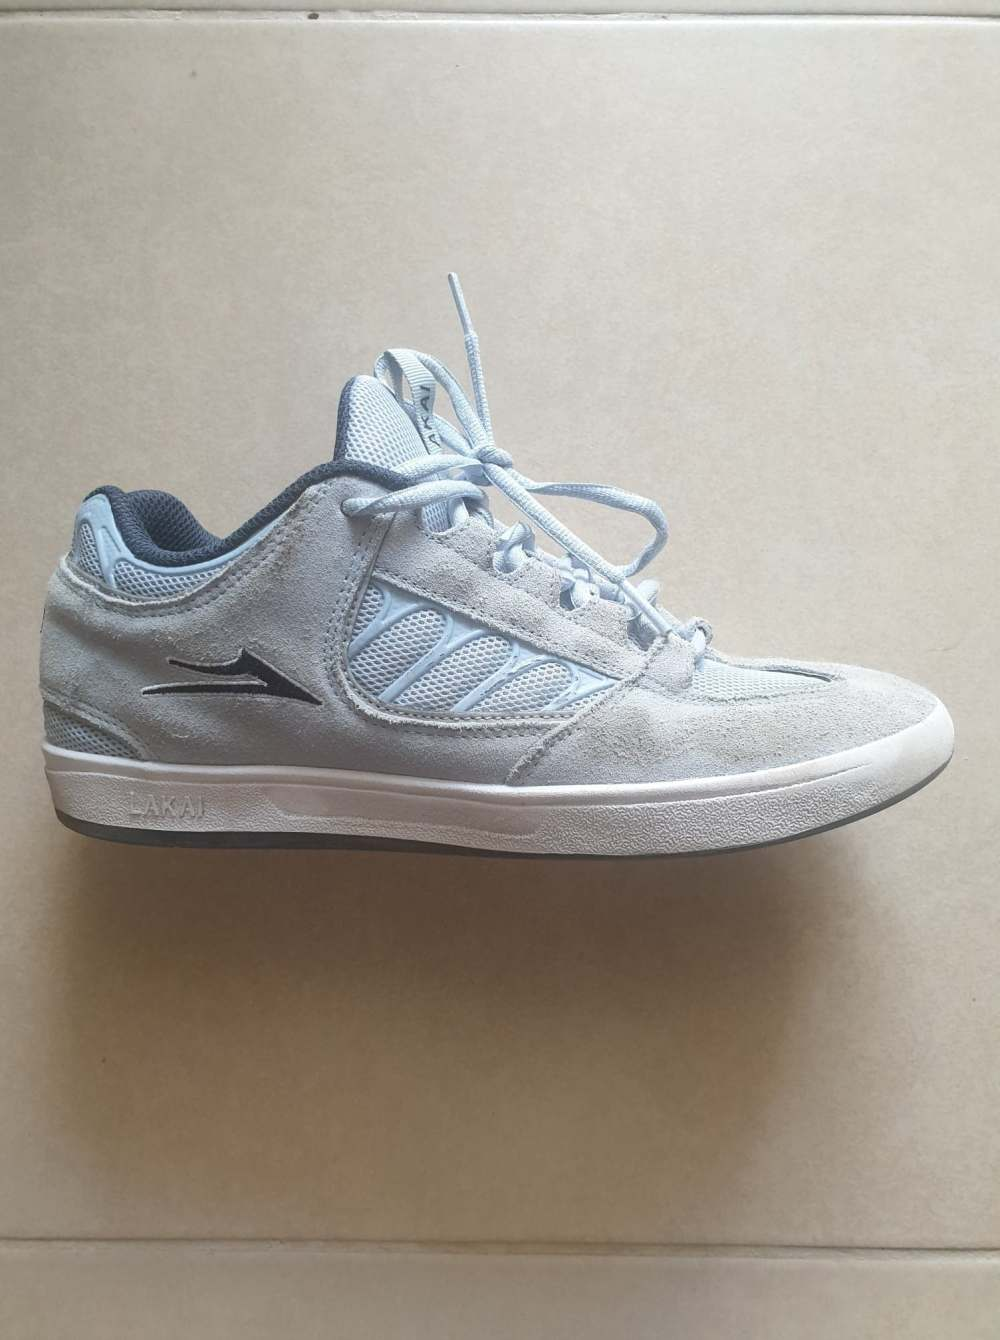 lakai carroll shoes (9)